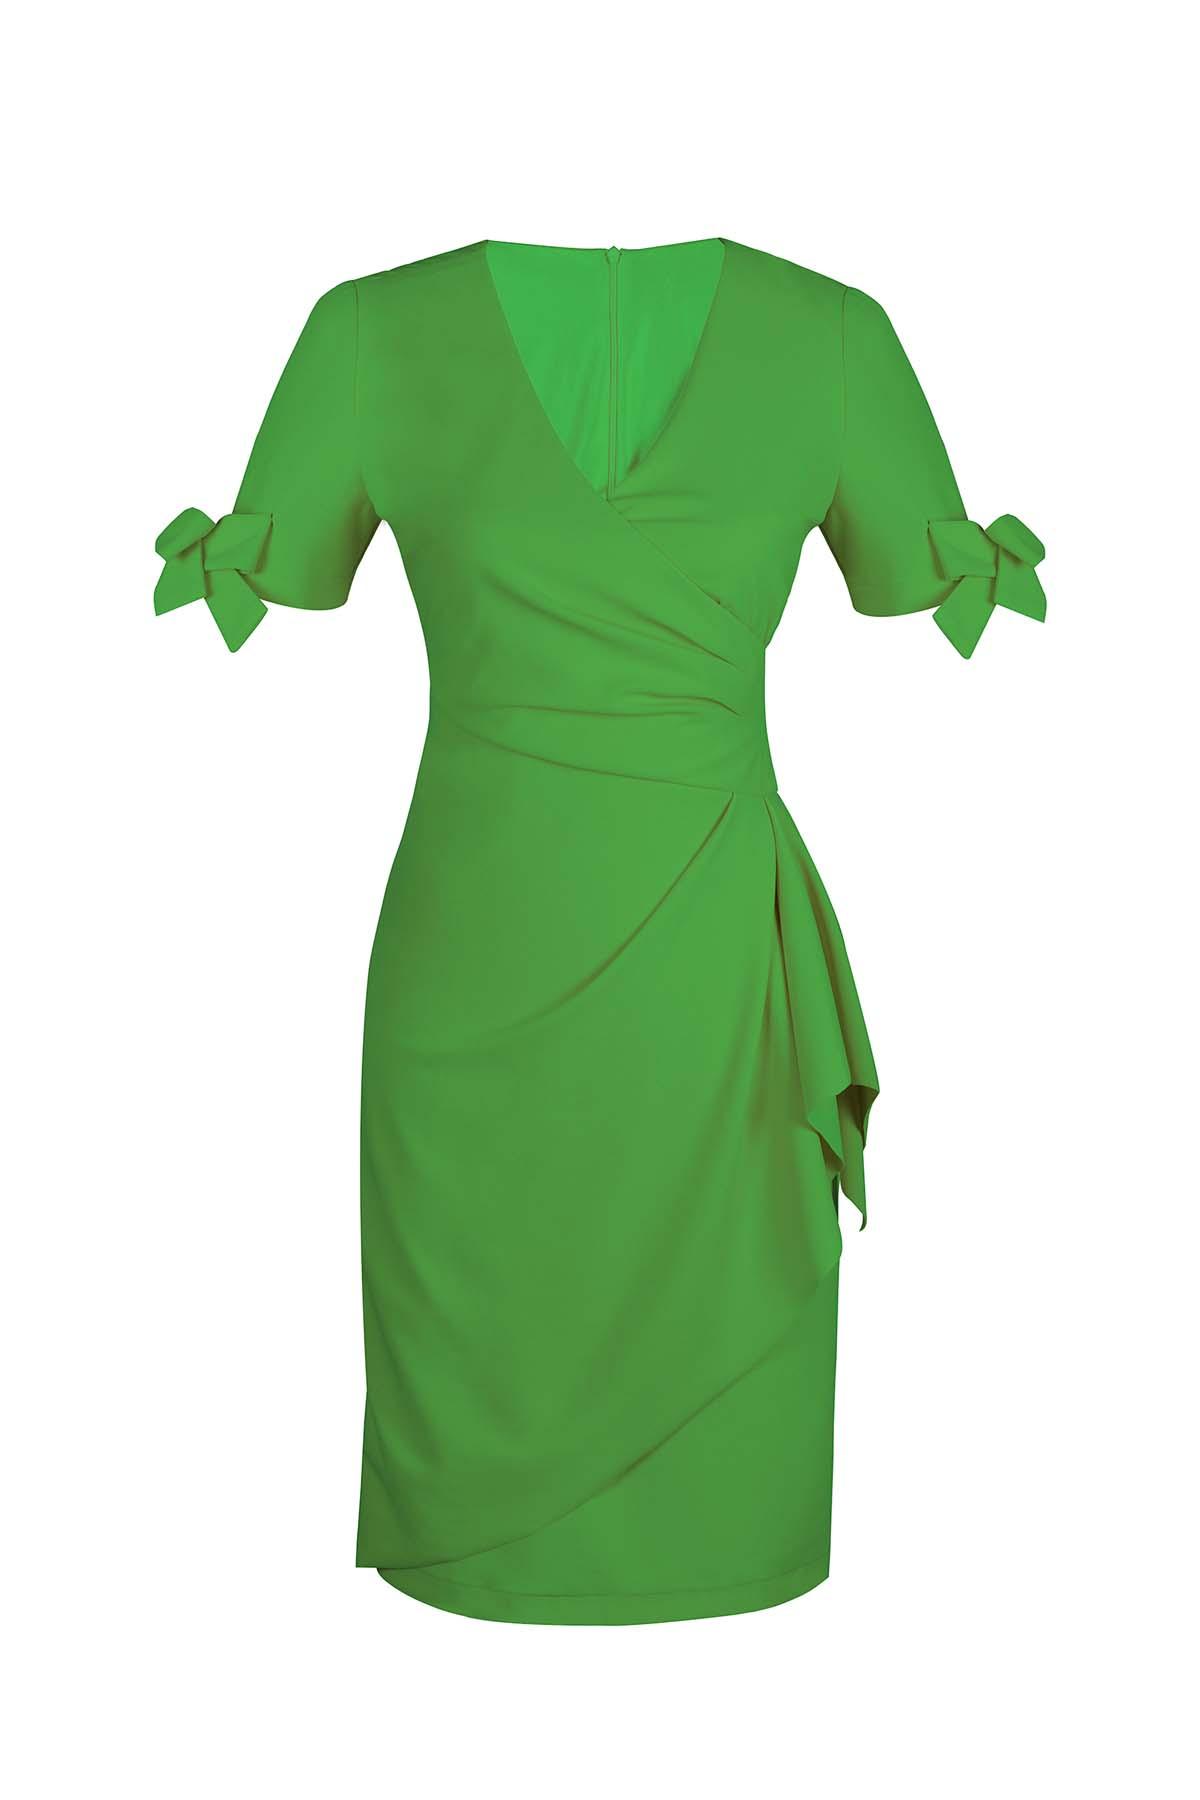 Teria Yabar - Vestido mini verde